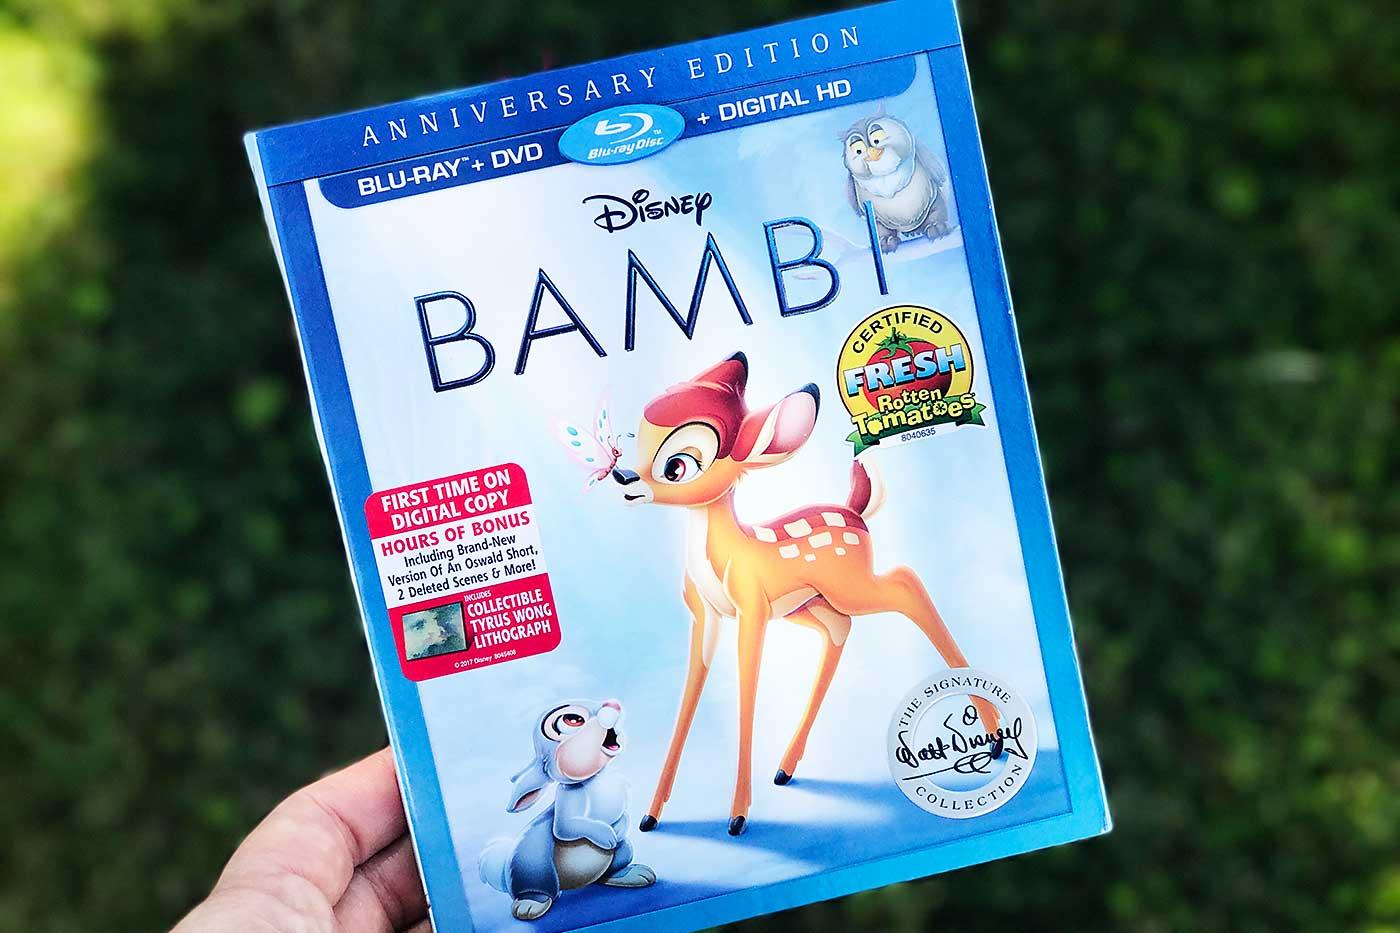 Bambi on Blu-ray